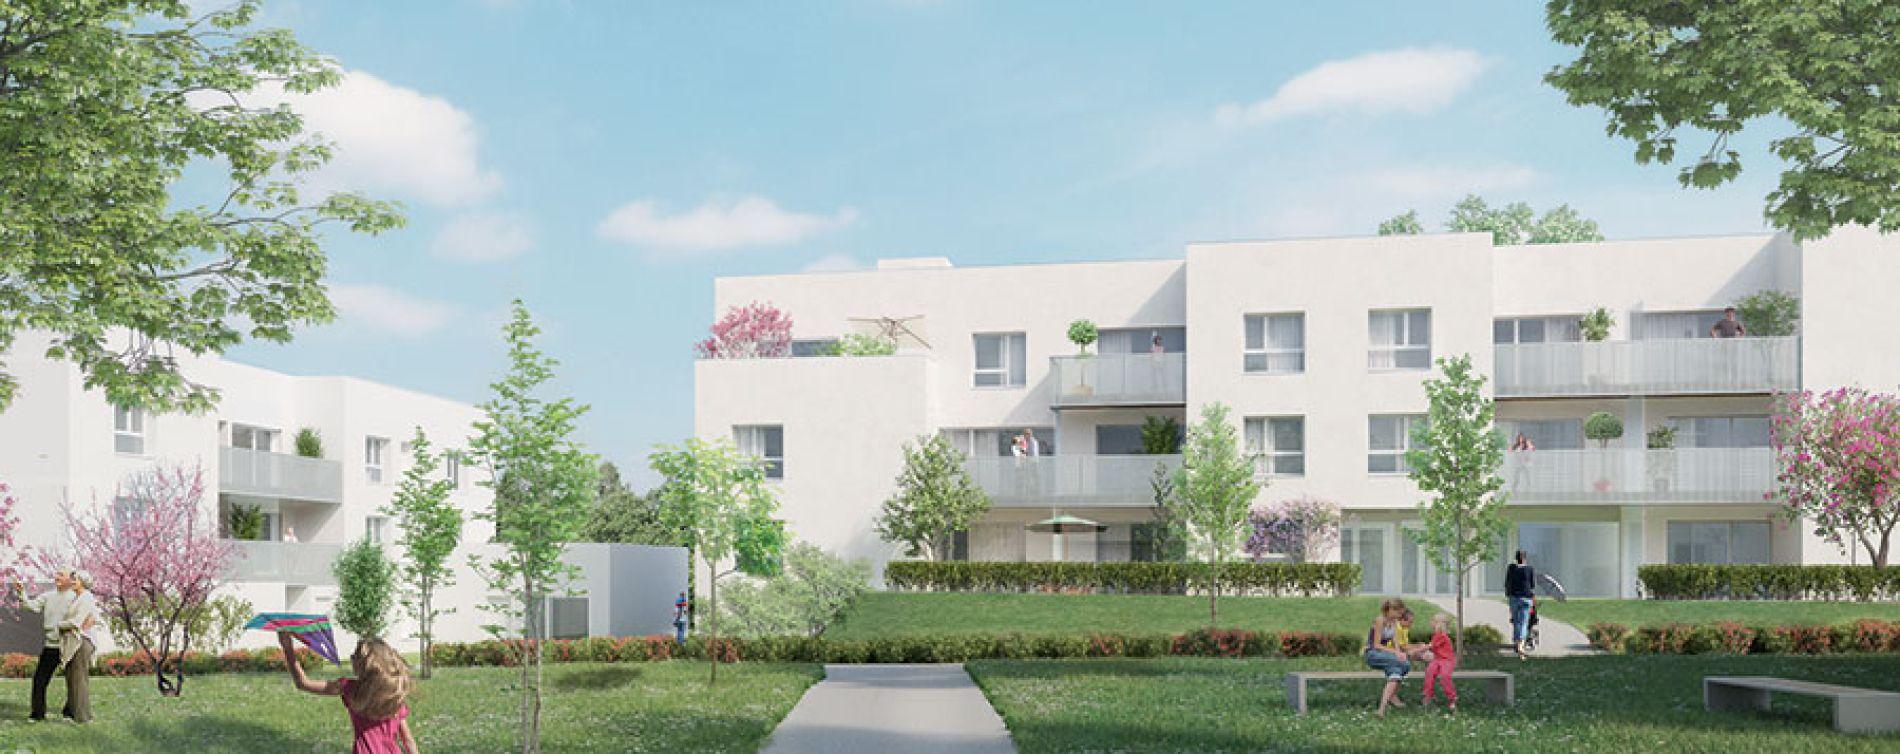 Chambray-lès-Tours : programme immobilier neuve « Programme immobilier n°215078 »